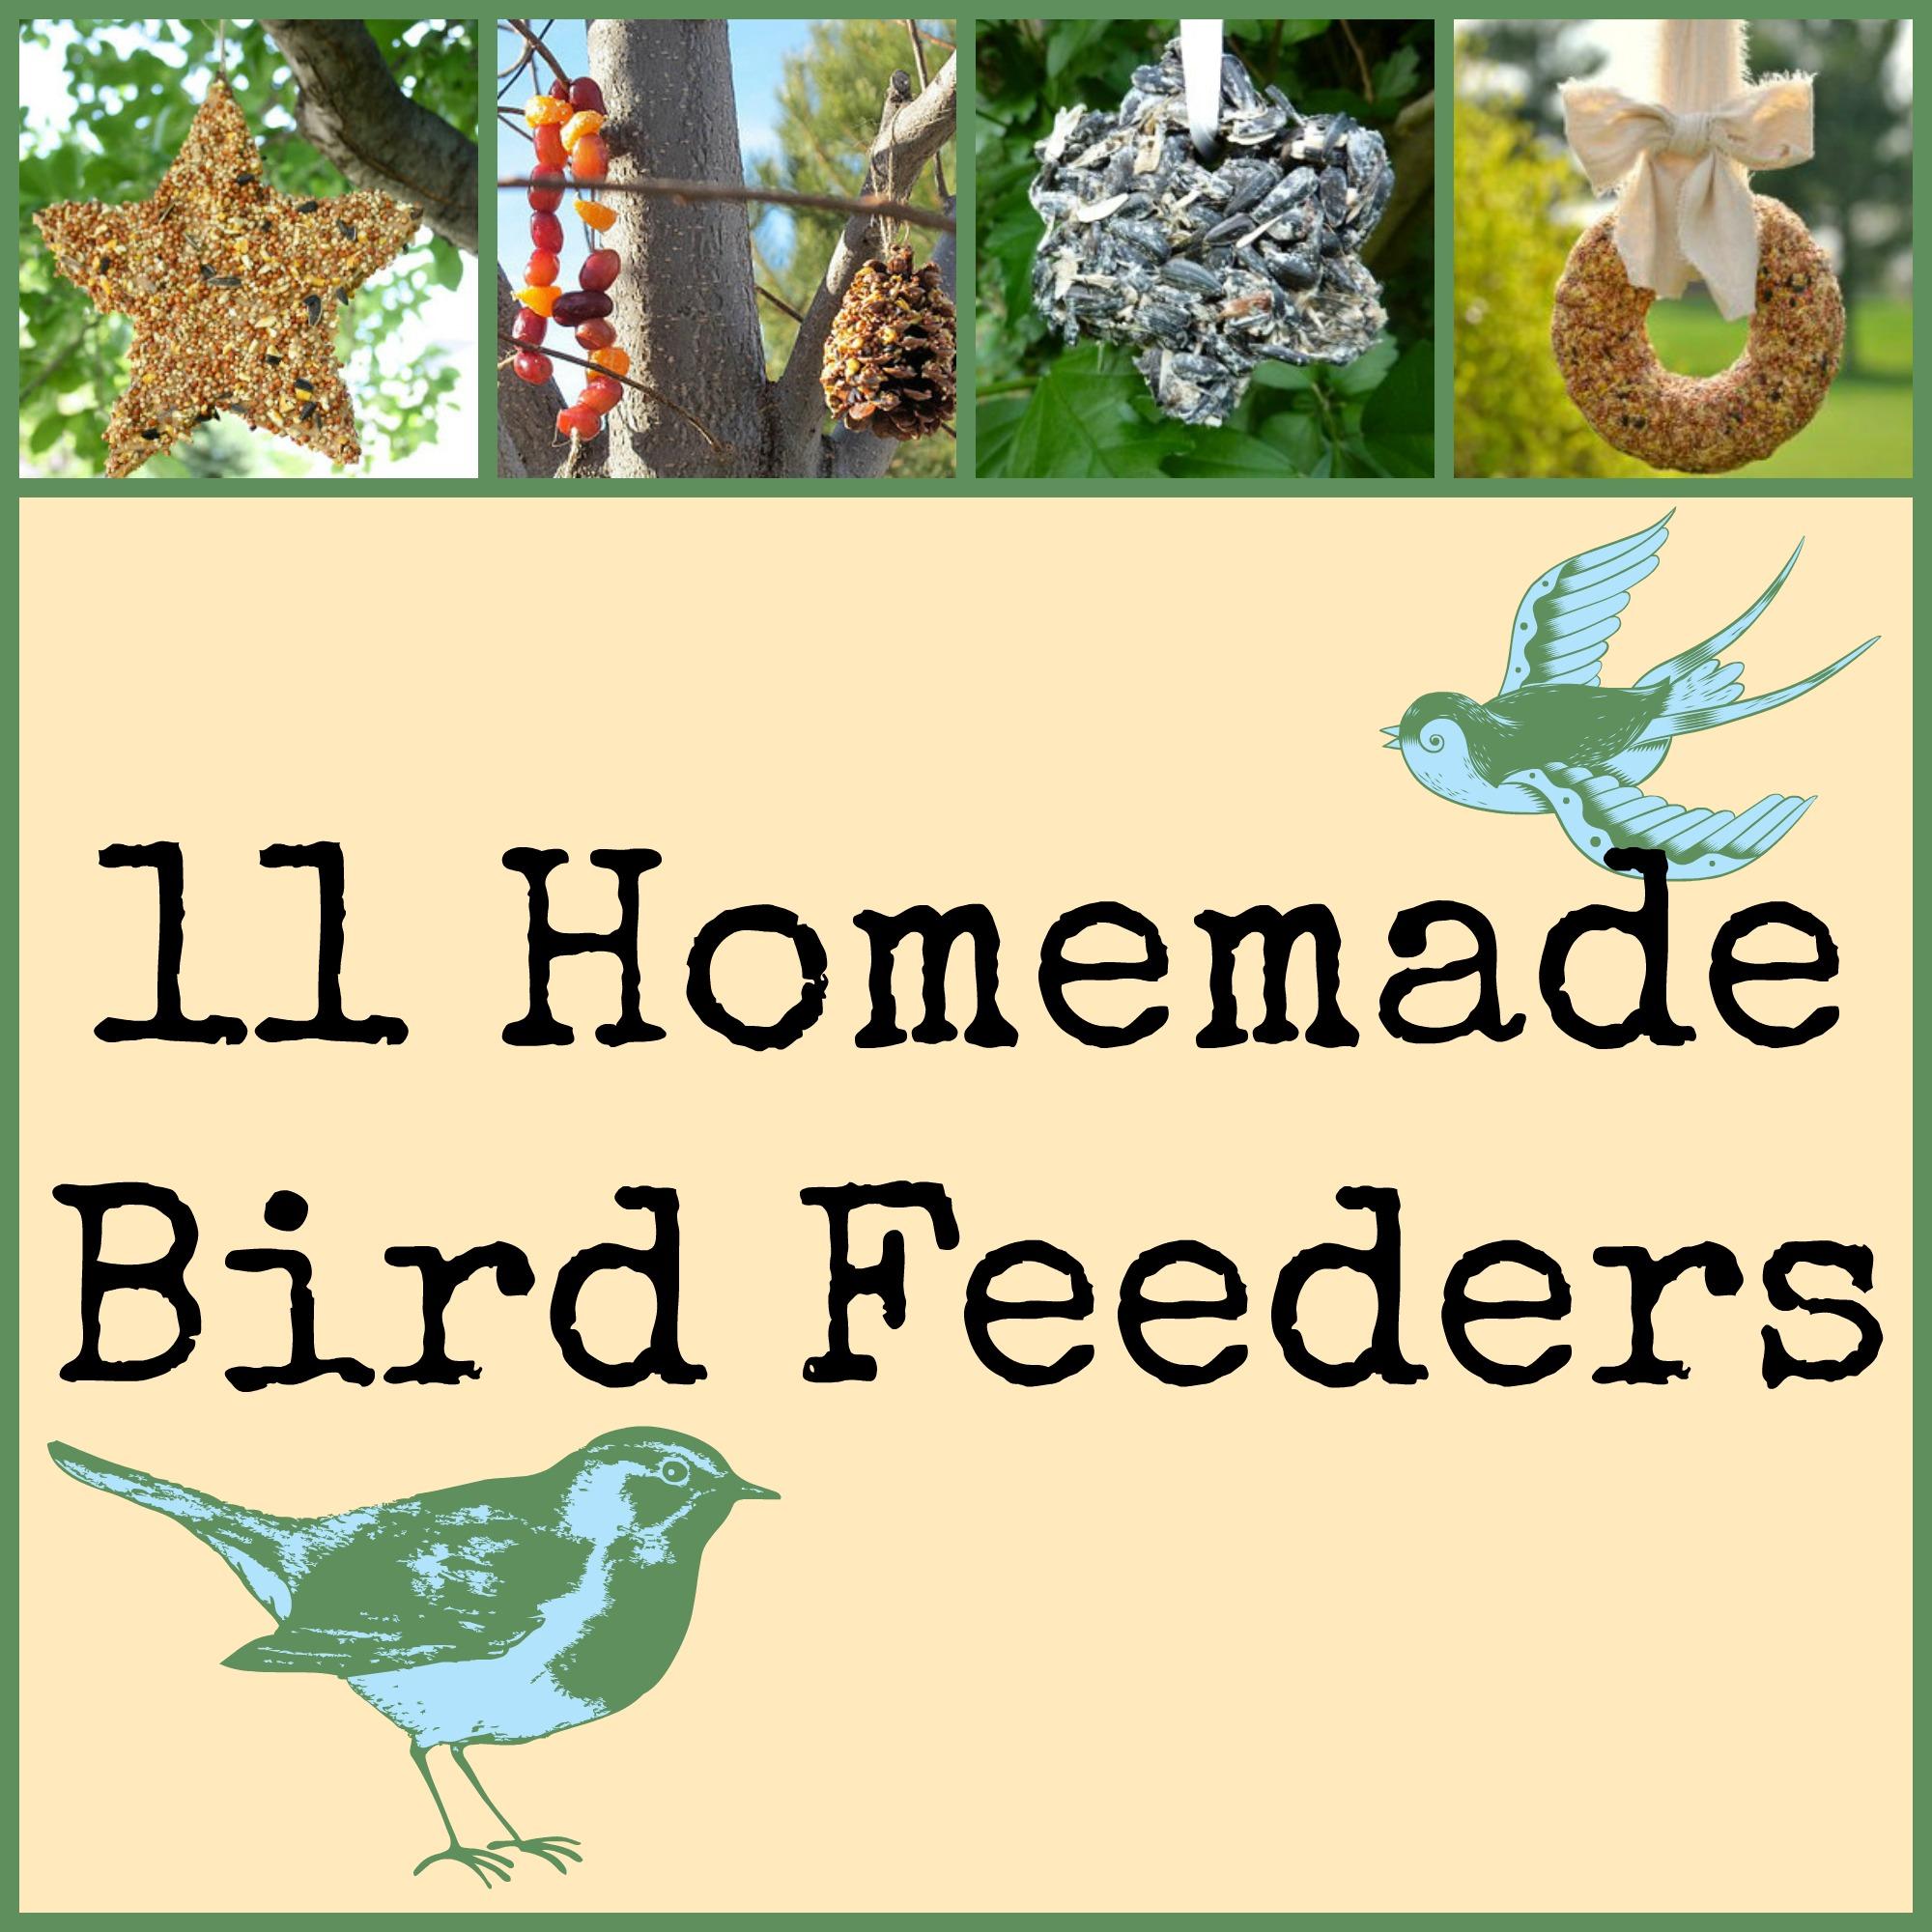 11 Homemade Bird Feeders